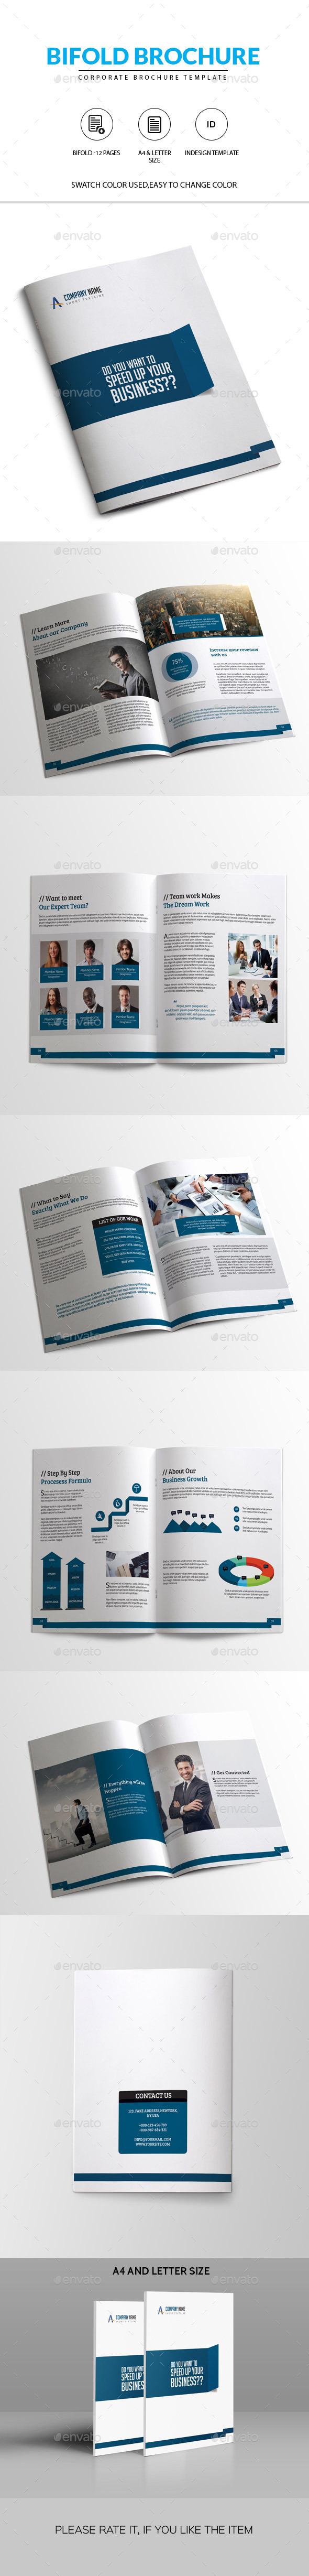 Corporate Brochure/Catalog-Indesign Template - Corporate Brochures